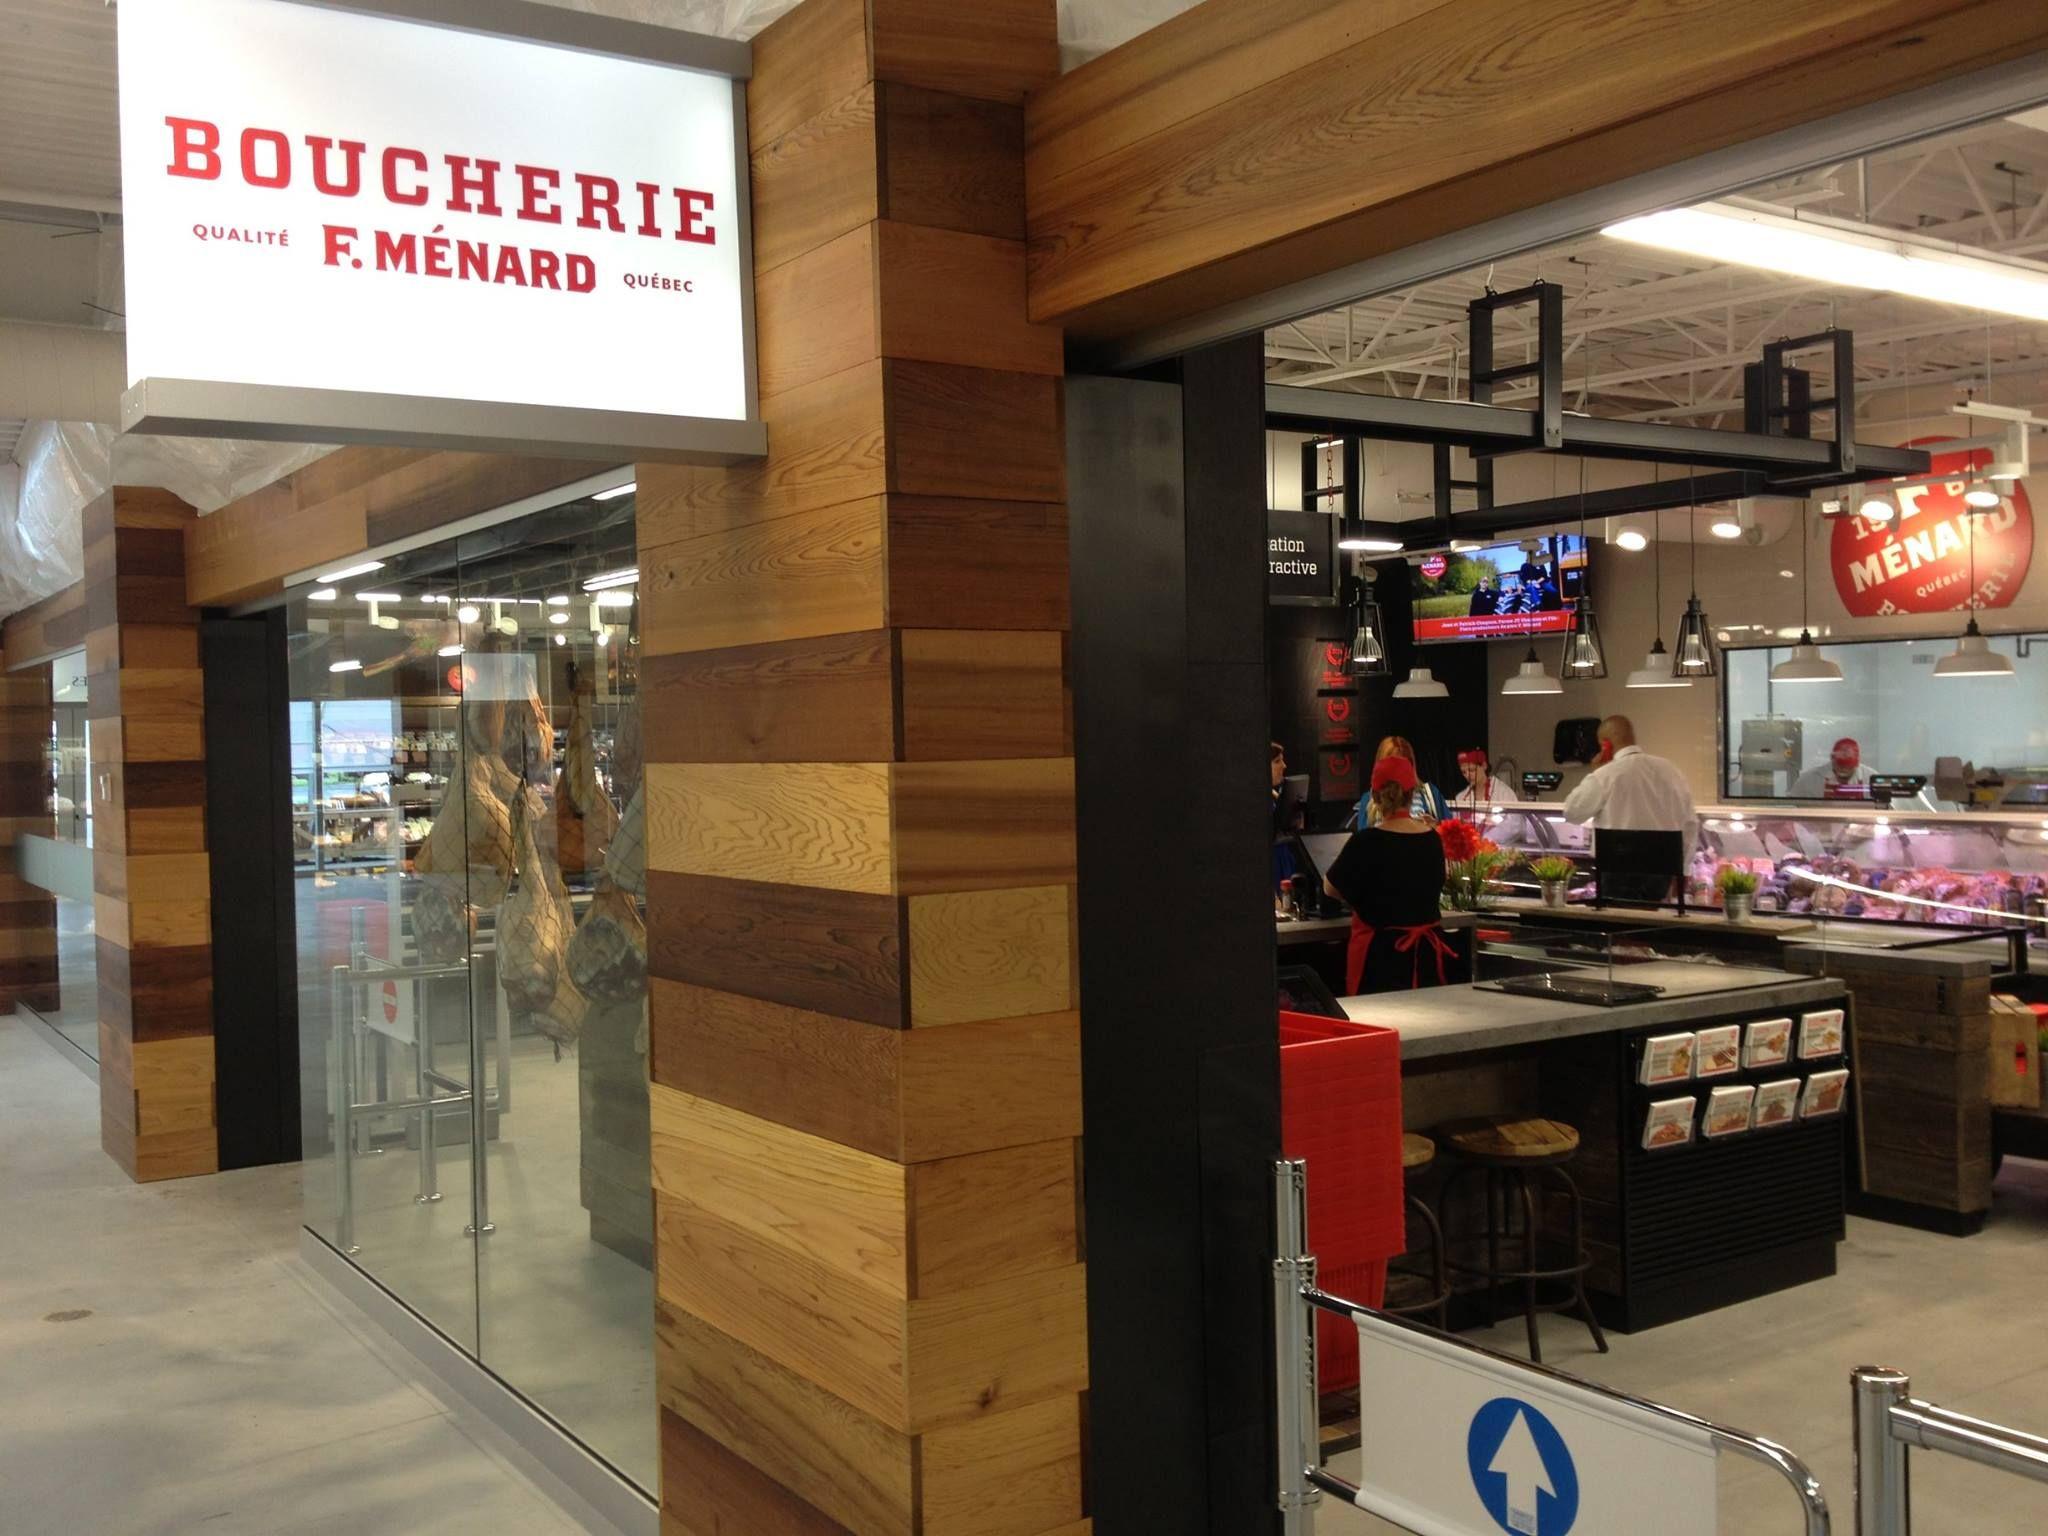 White apron penn quarter - Butchery Opening New Concept